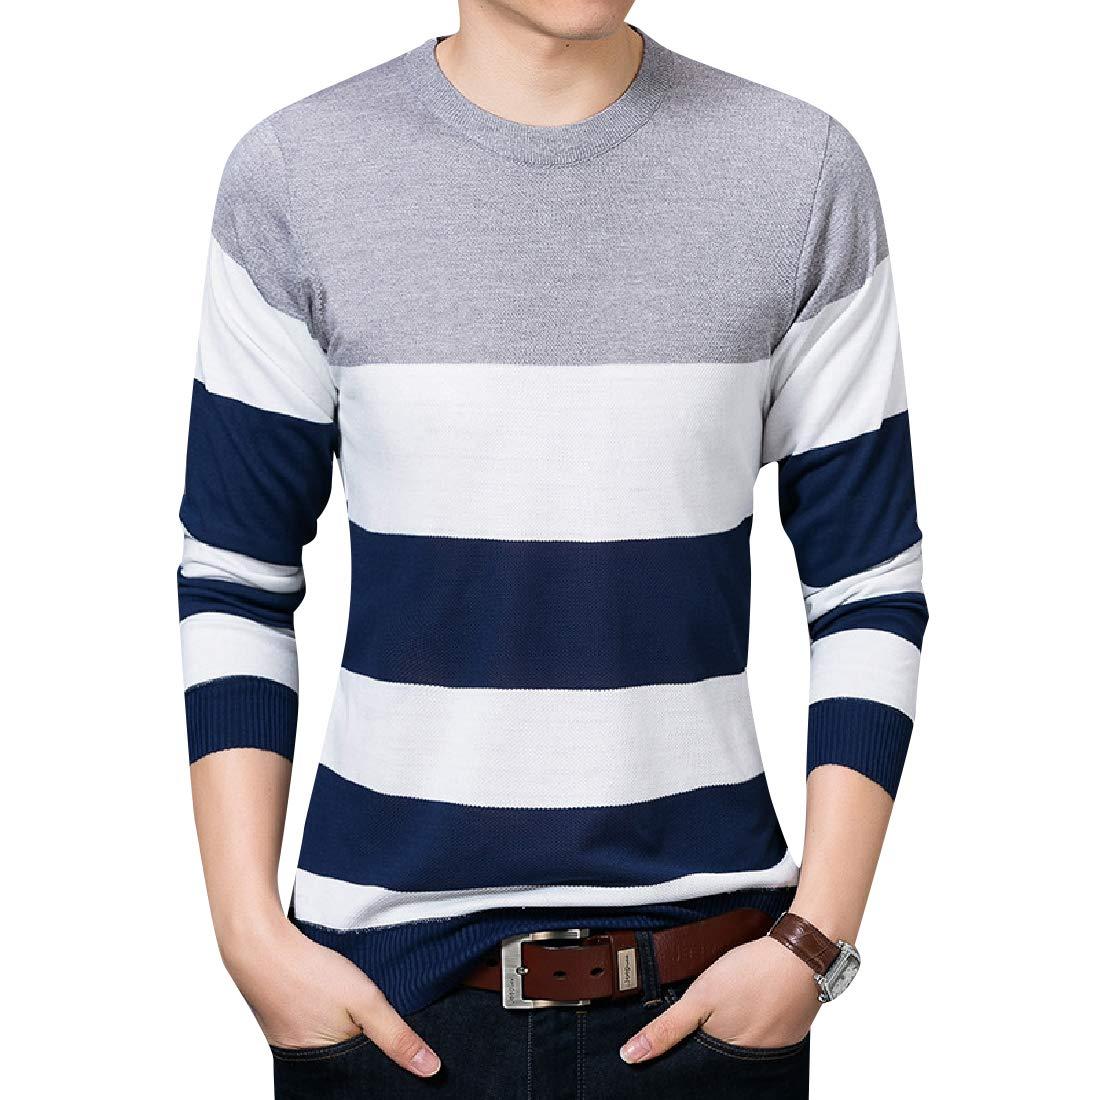 Coolred-Men Slouchy Contrast Long Sleeve Knitwear